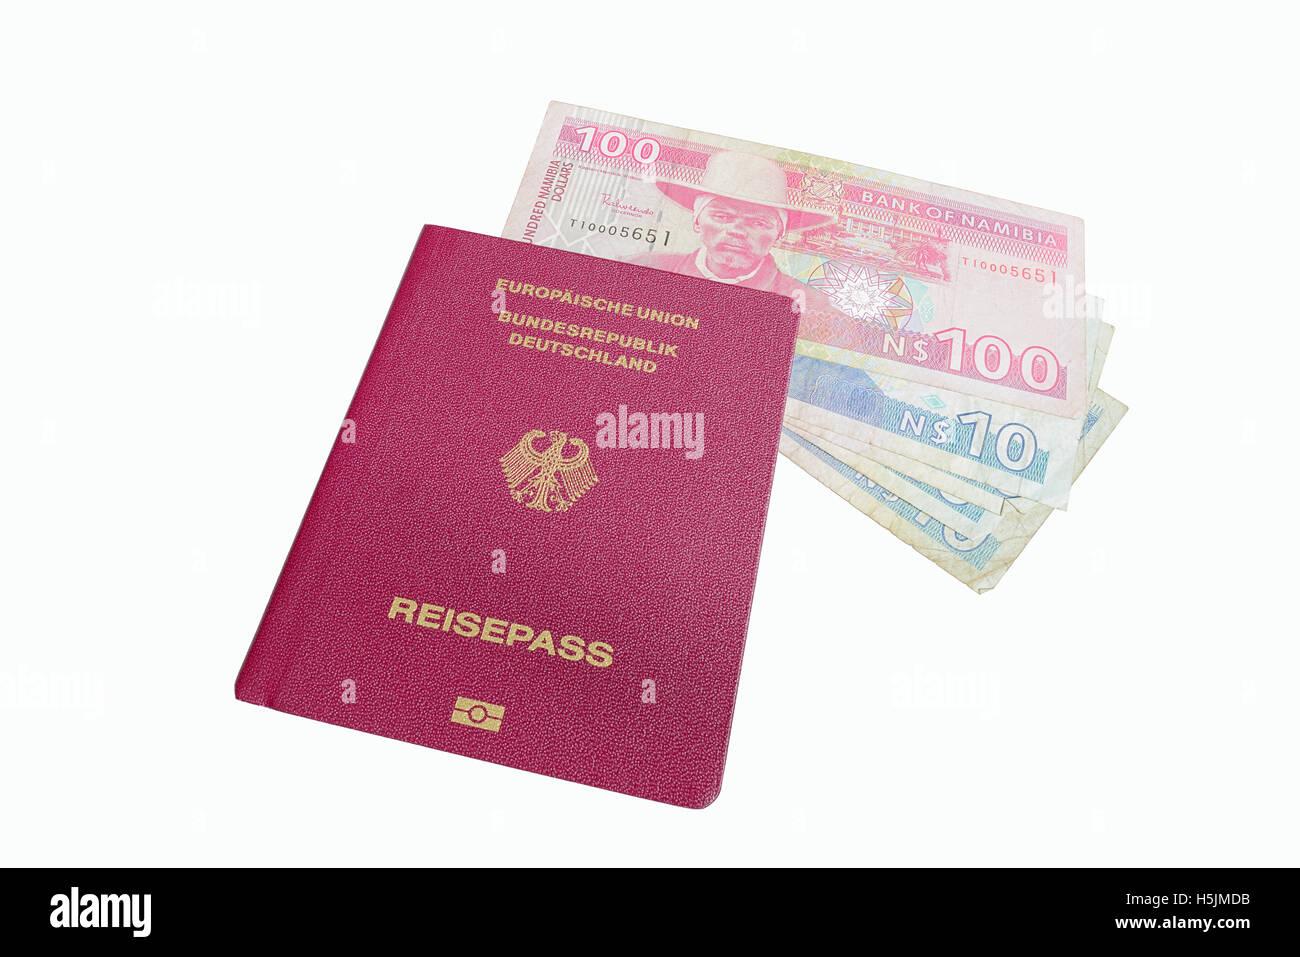 German Passport and Namibia Dollars - Stock Image